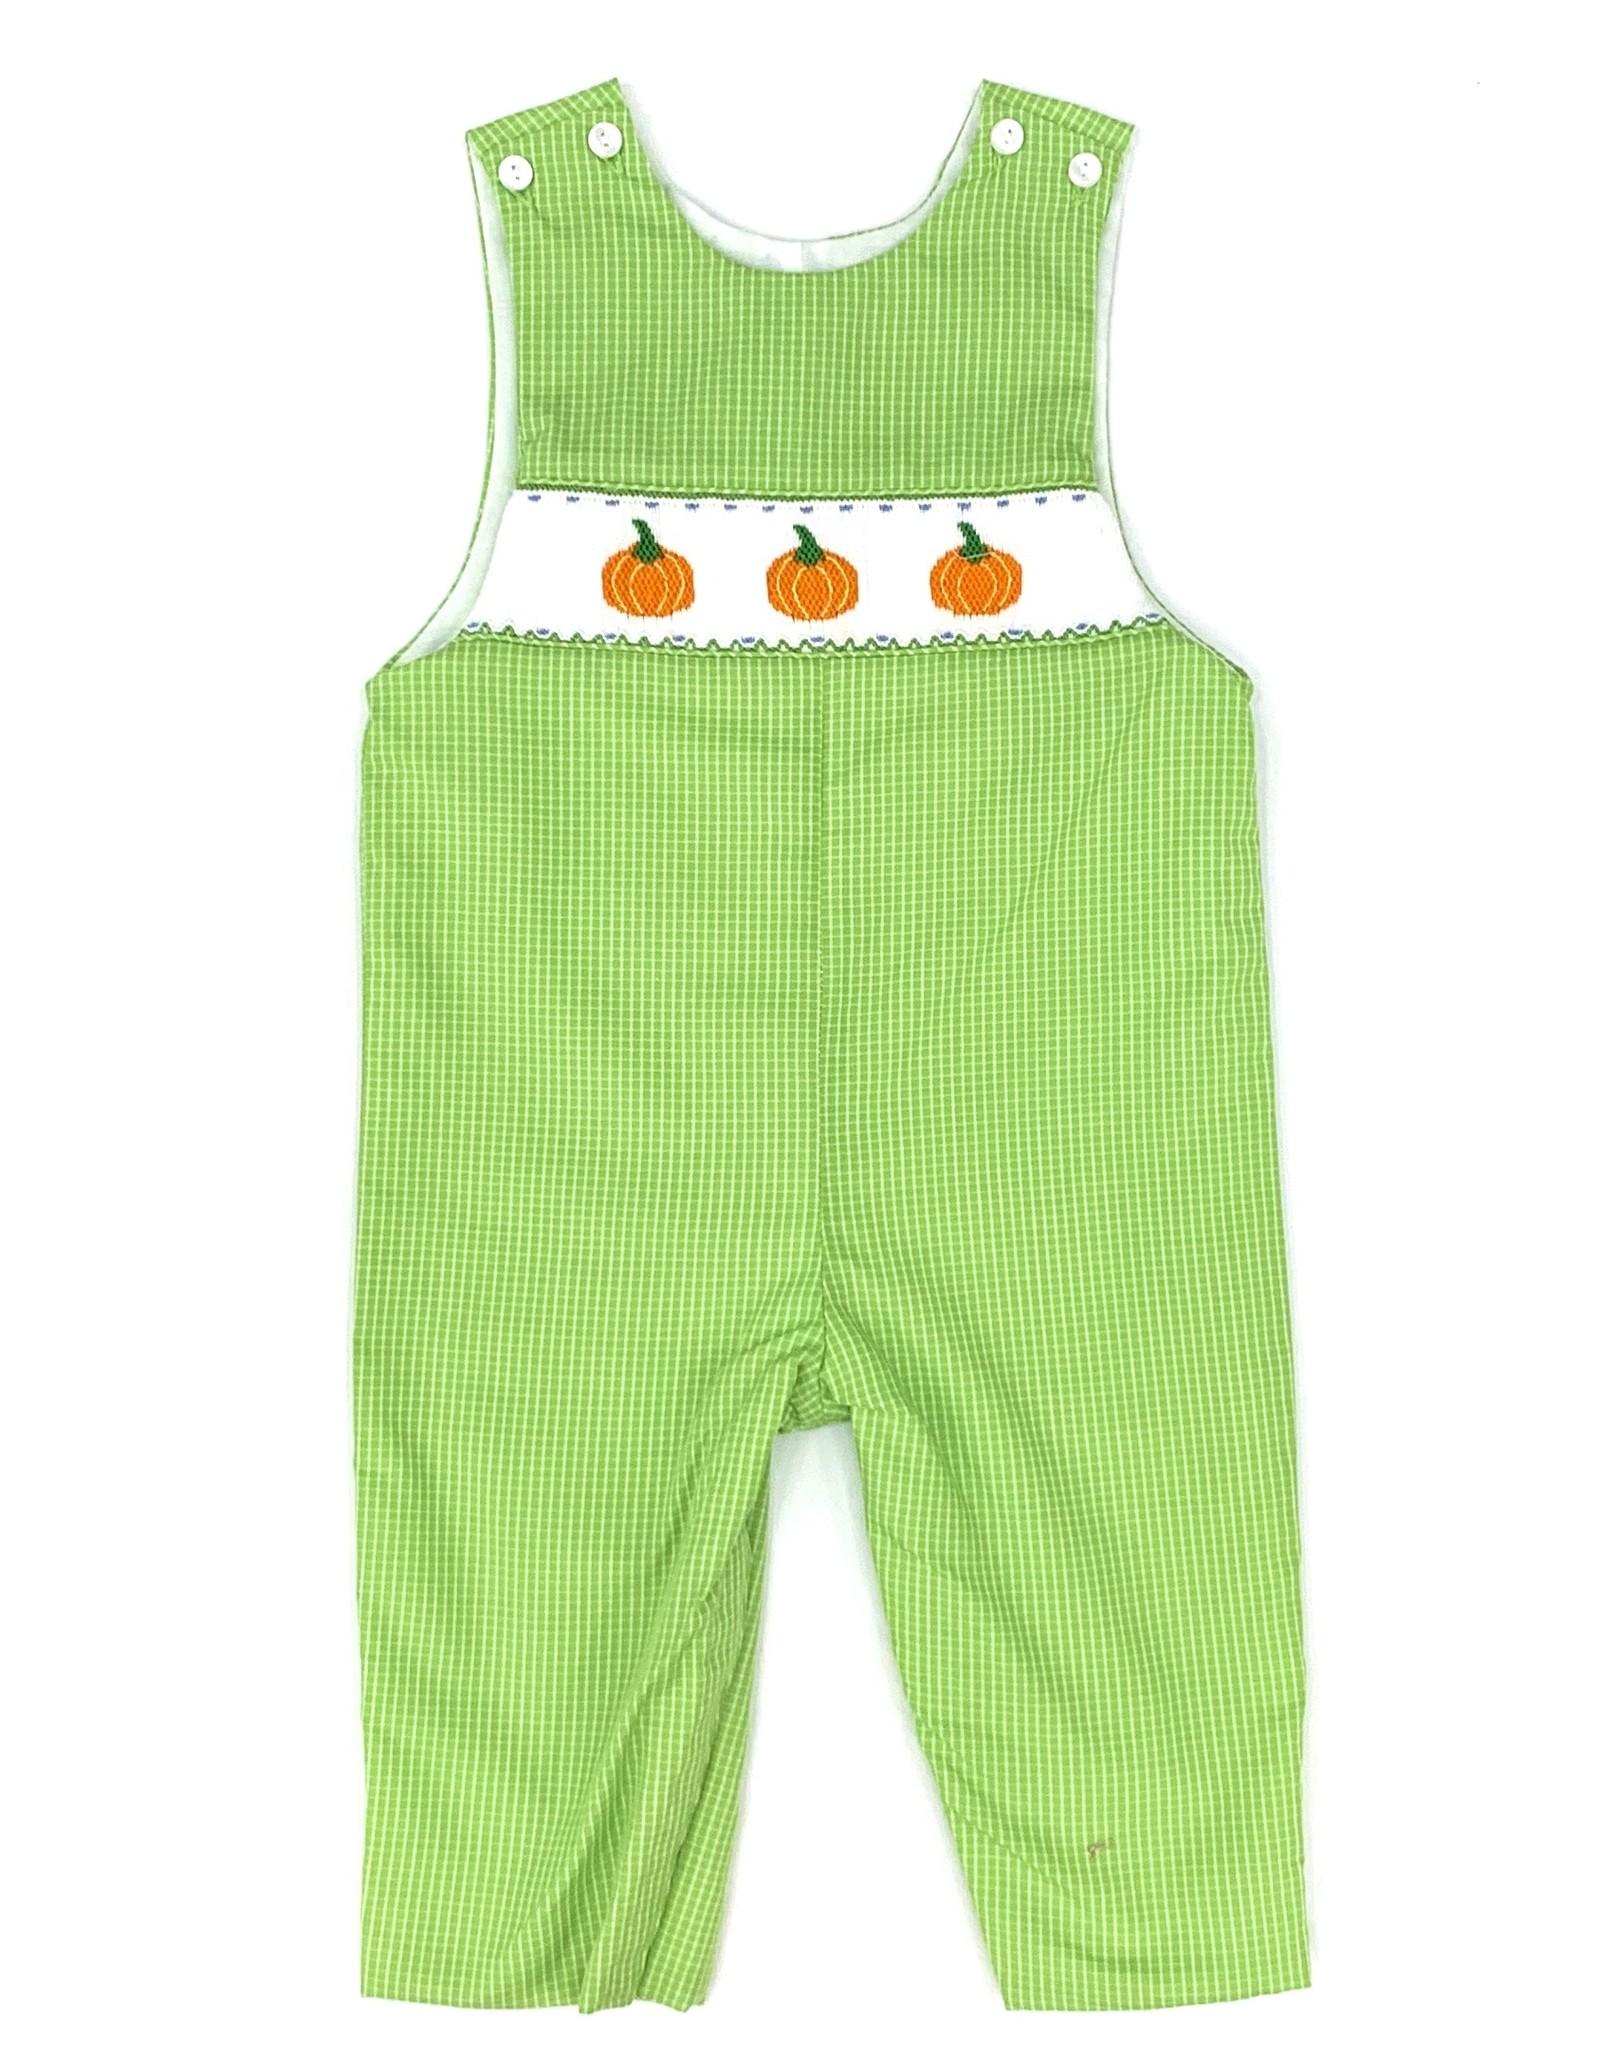 Petit Bebe Lime Green Boy's Pumpkin Jon Jon